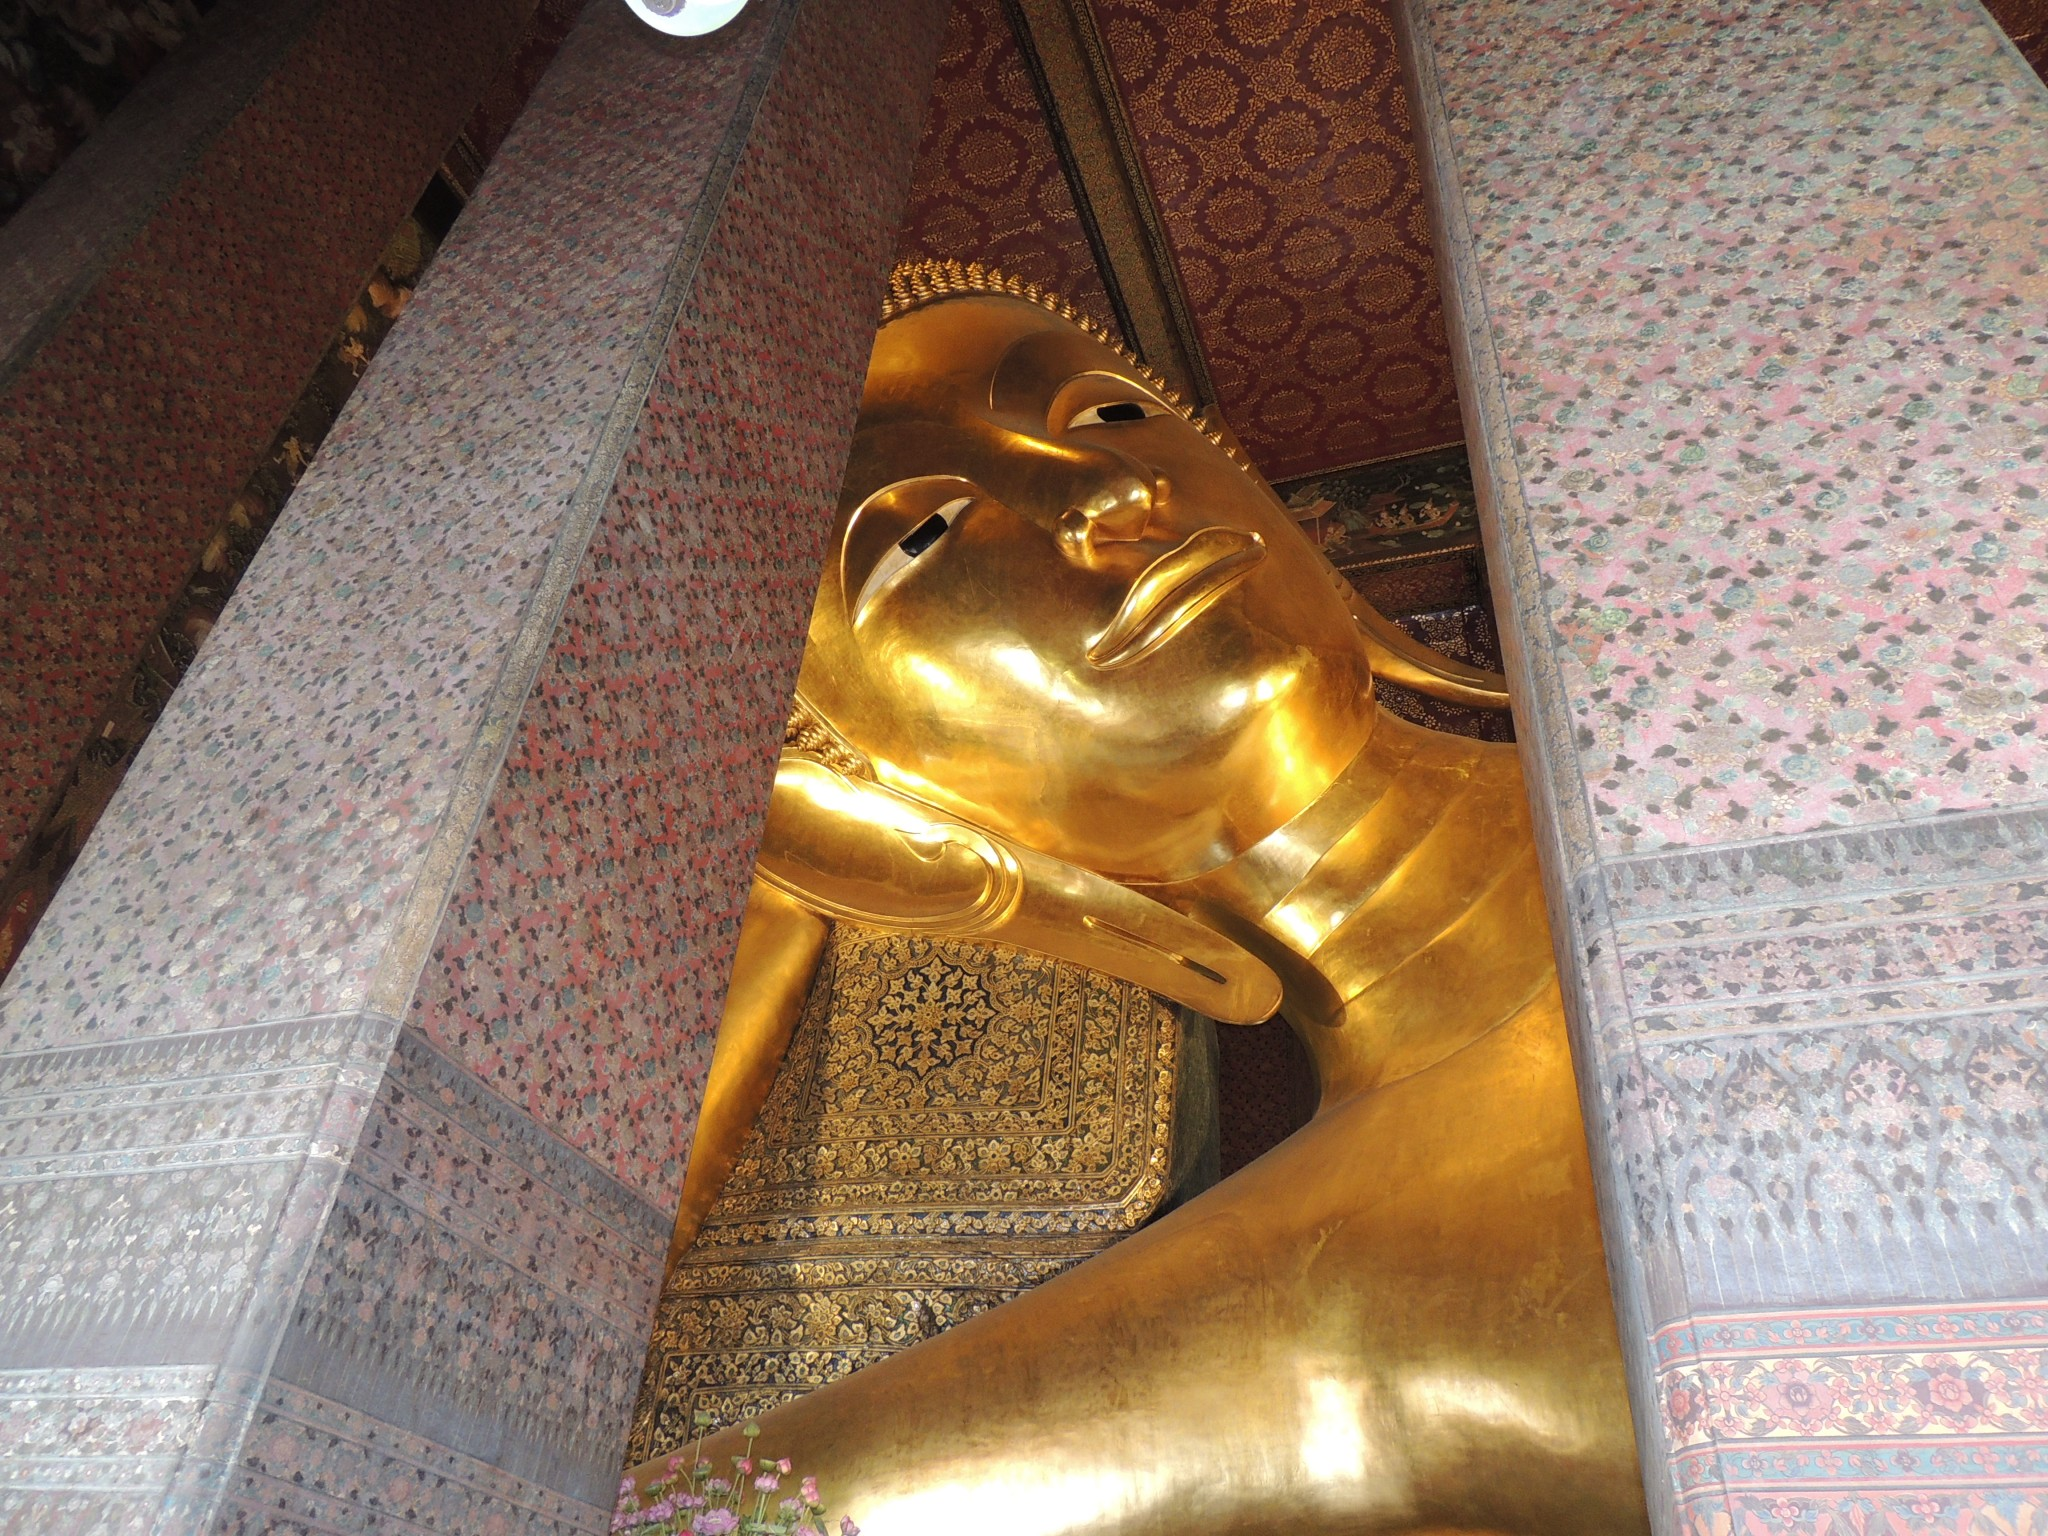 Thailand, Wat Pho; de tempel van de liggende Boeddha